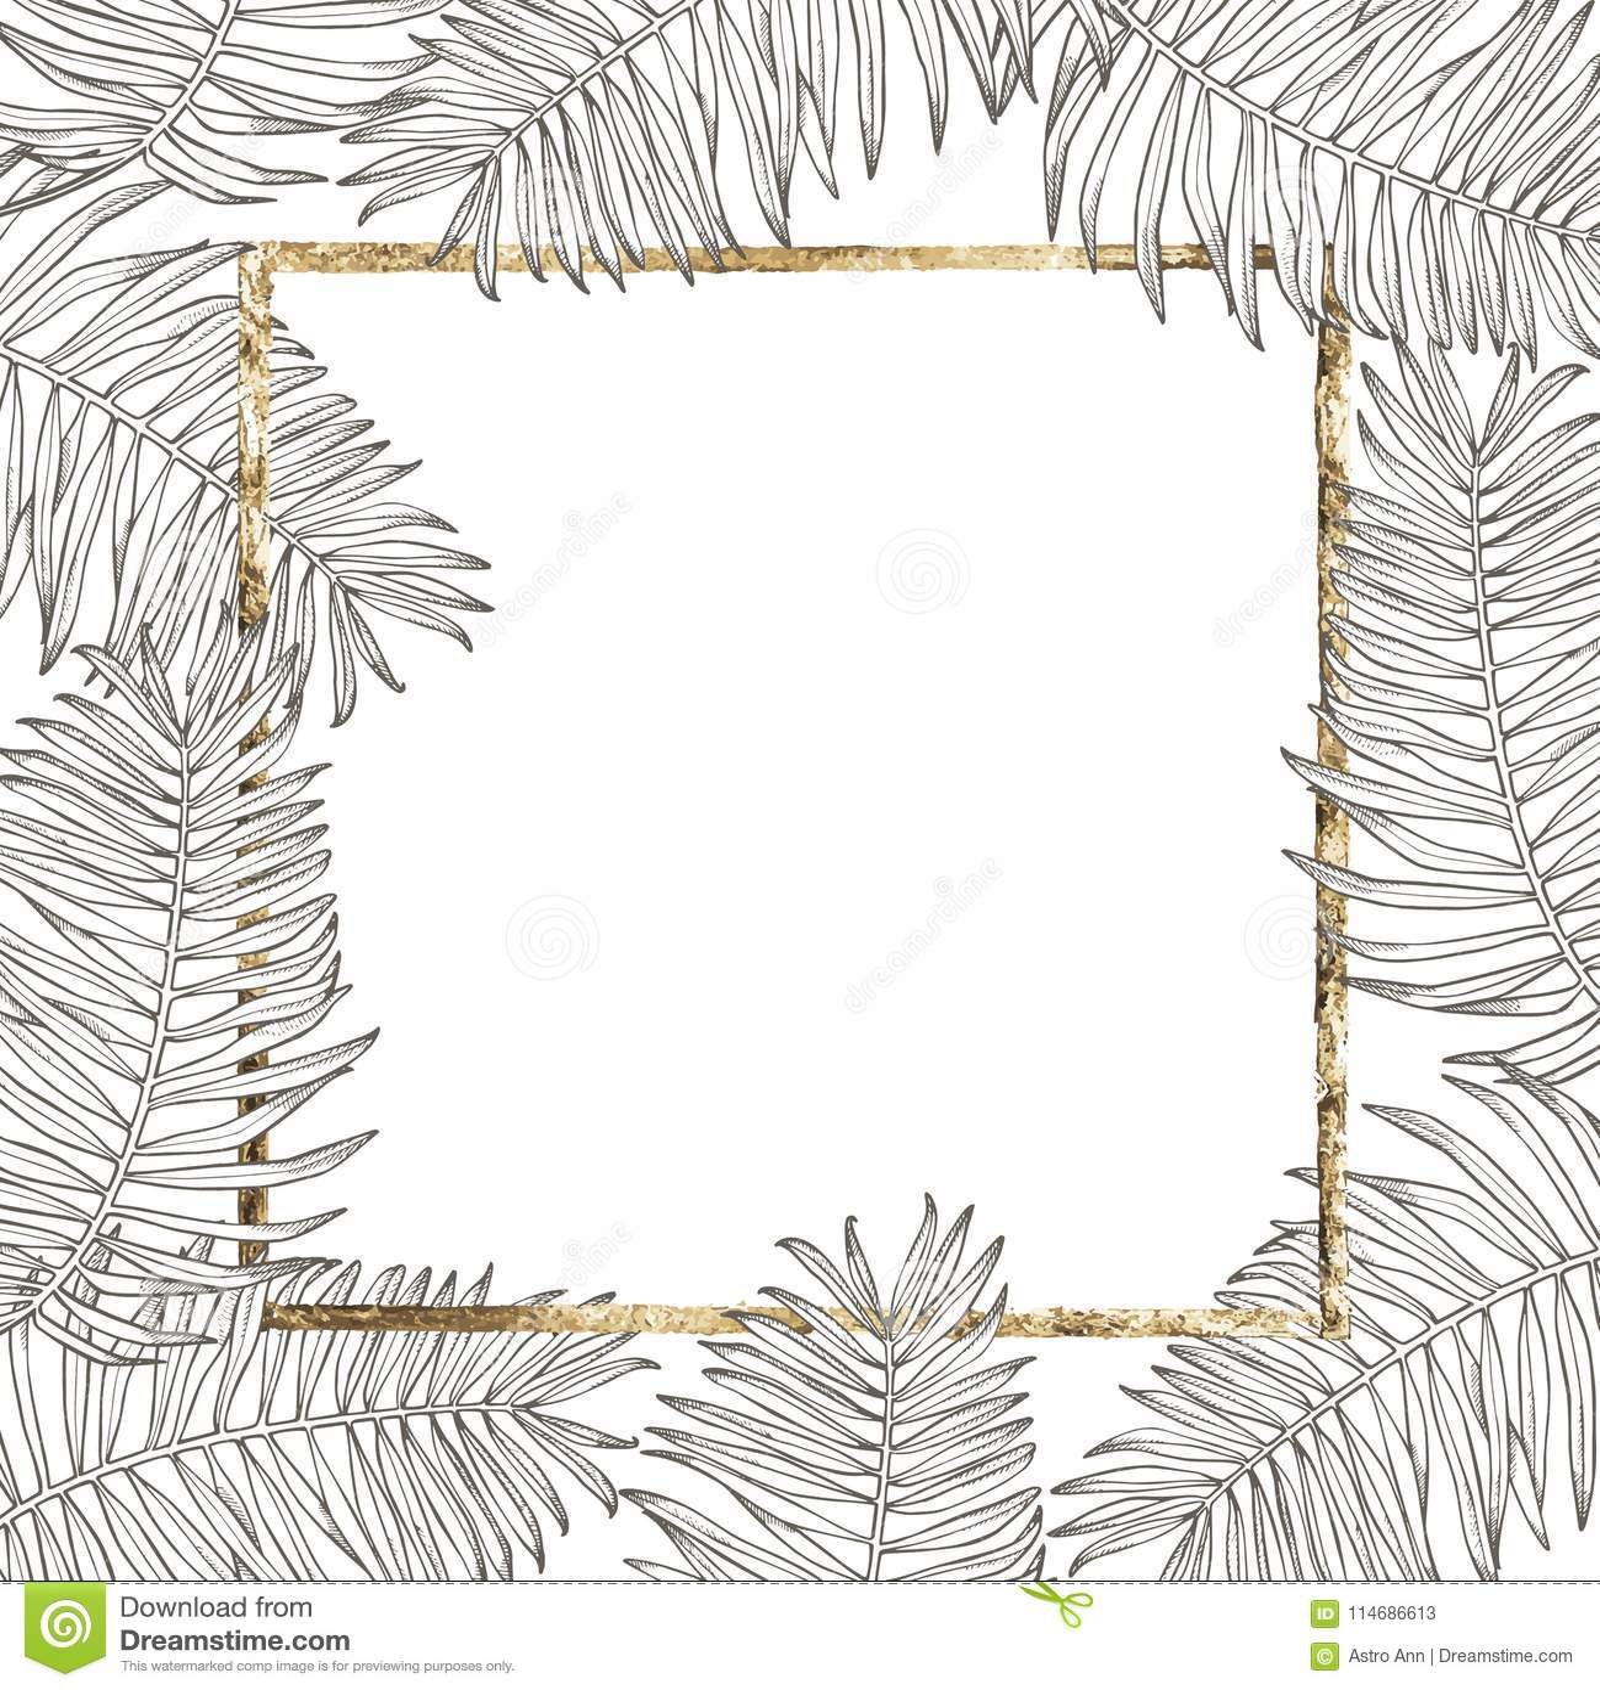 Summer tropical leaves vector design floral background illustration download comp stopboris Choice Image